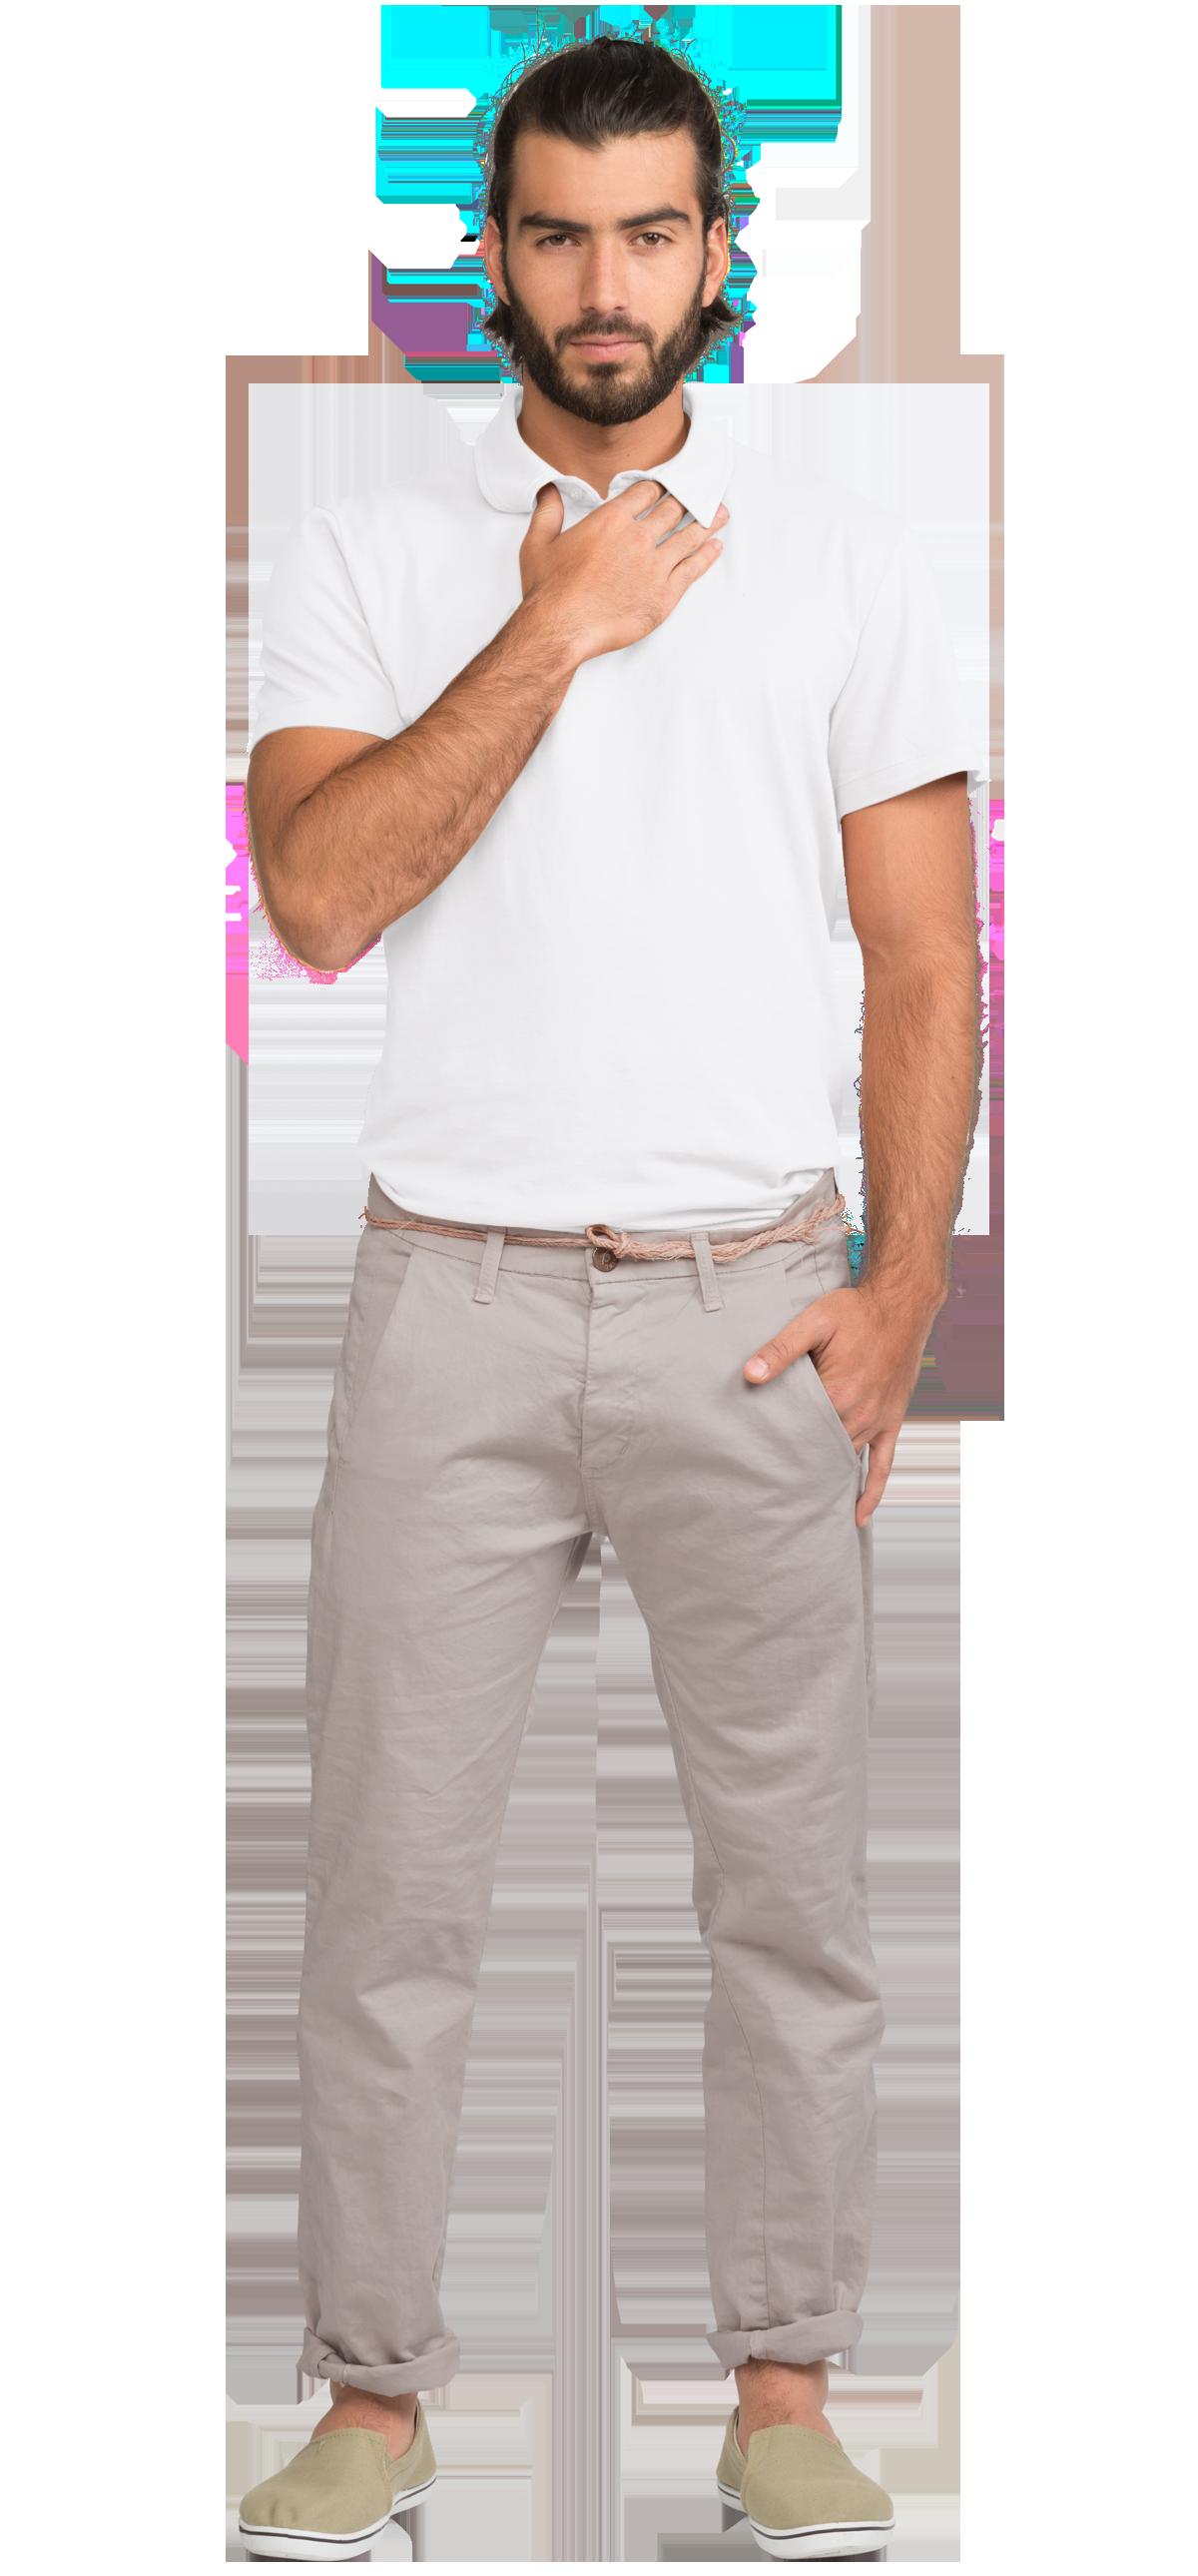 Neushop men tops oxides louis for Man in white shirt